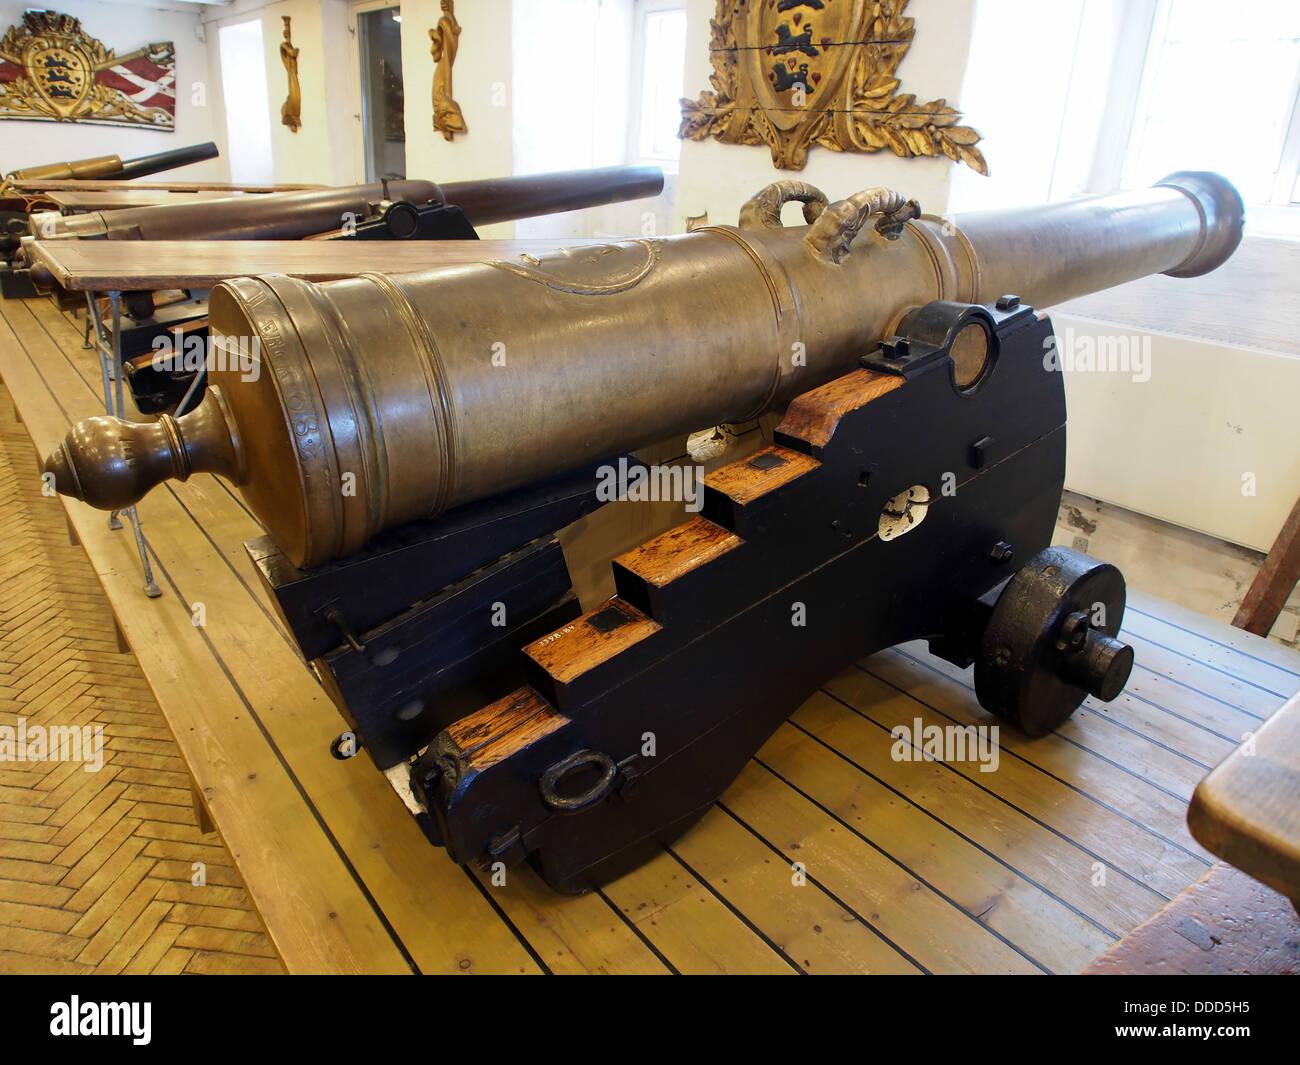 1768 12 pounder metal muzzle-loading gun, pic2 - Stock Image